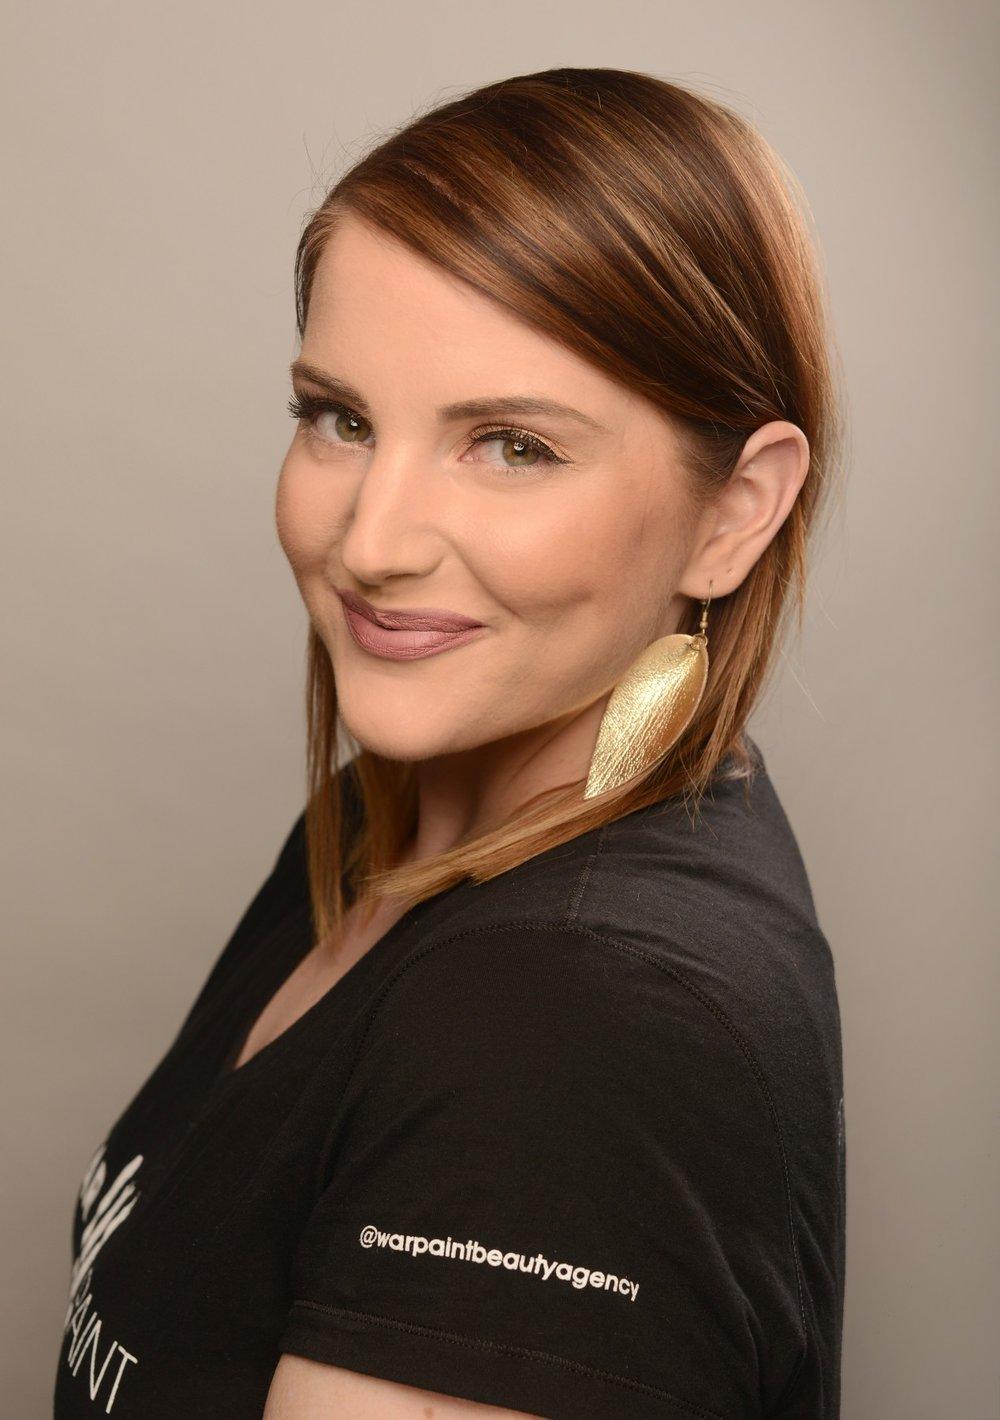 Hillary Kline. Minneapolis Makeup Artist for WarPaint International Beauty Agency.